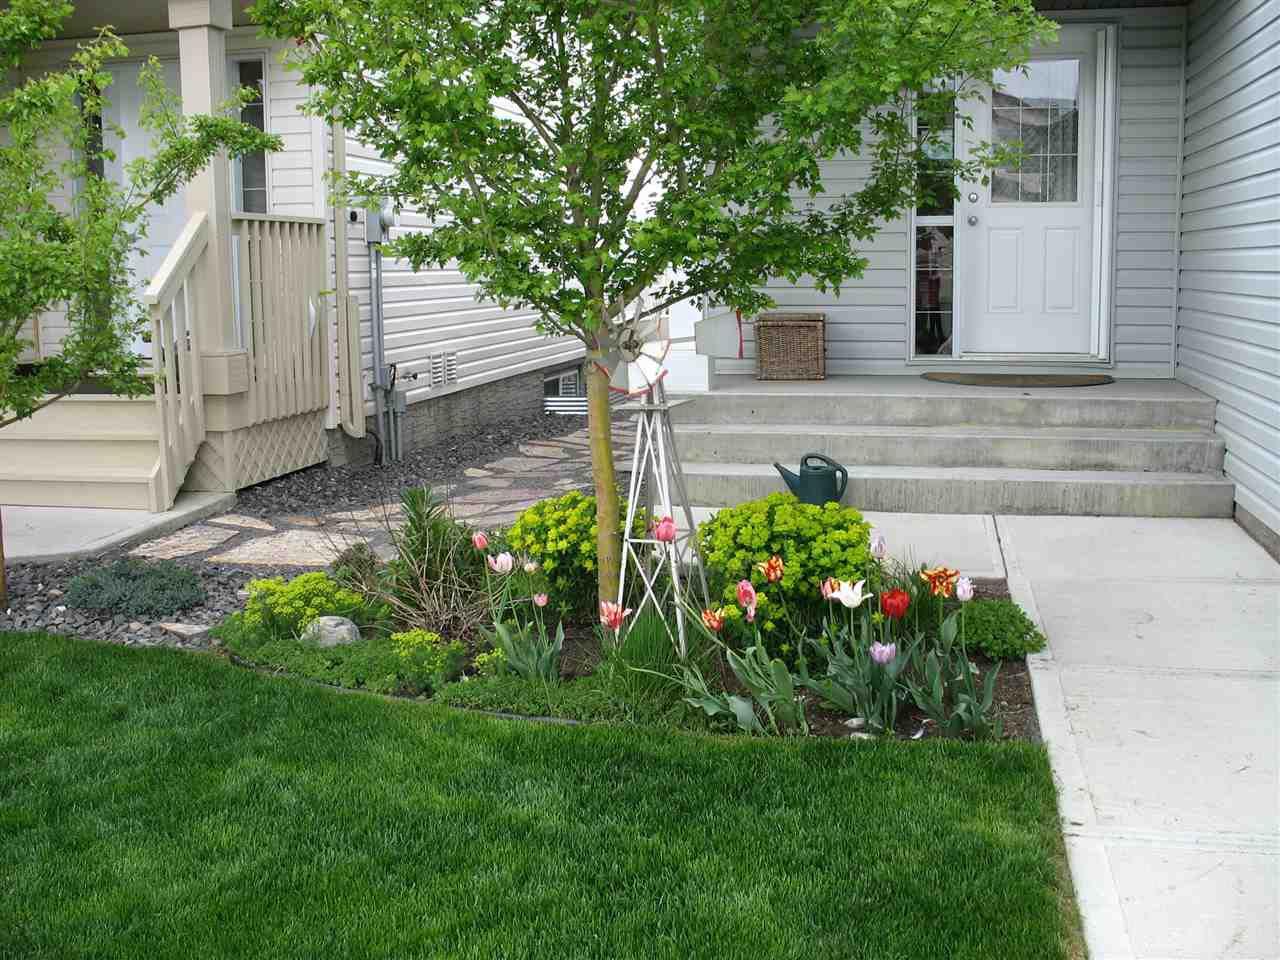 Main Photo: 1242 MCALLISTER Way in Edmonton: Zone 55 House for sale : MLS®# E4155658